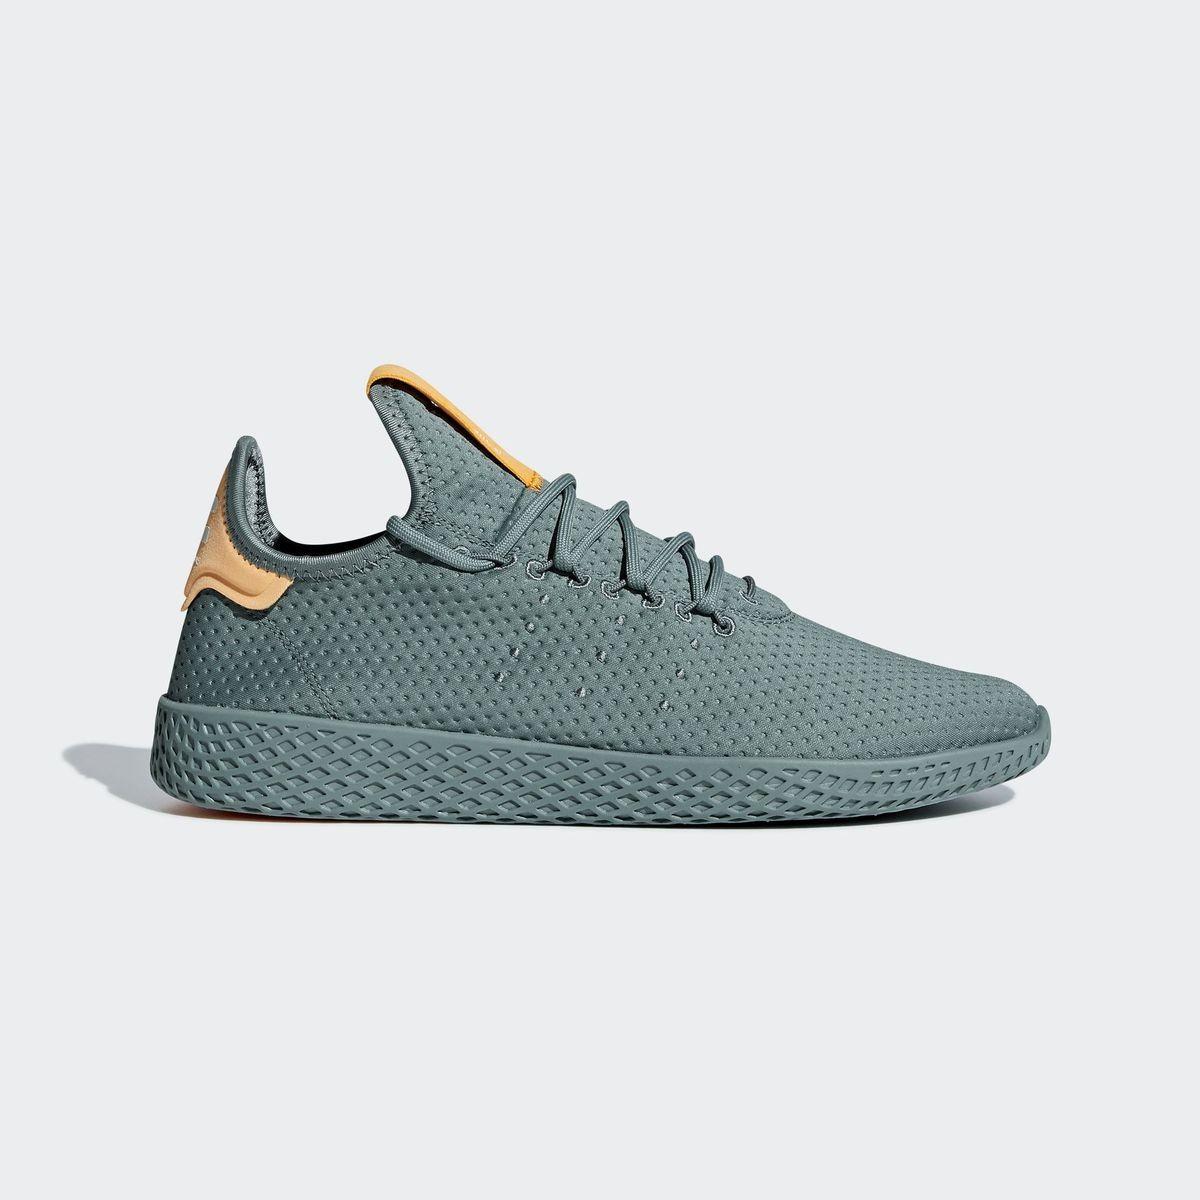 adidas Originals Femme Chaussures Taille 37 PHARRELL